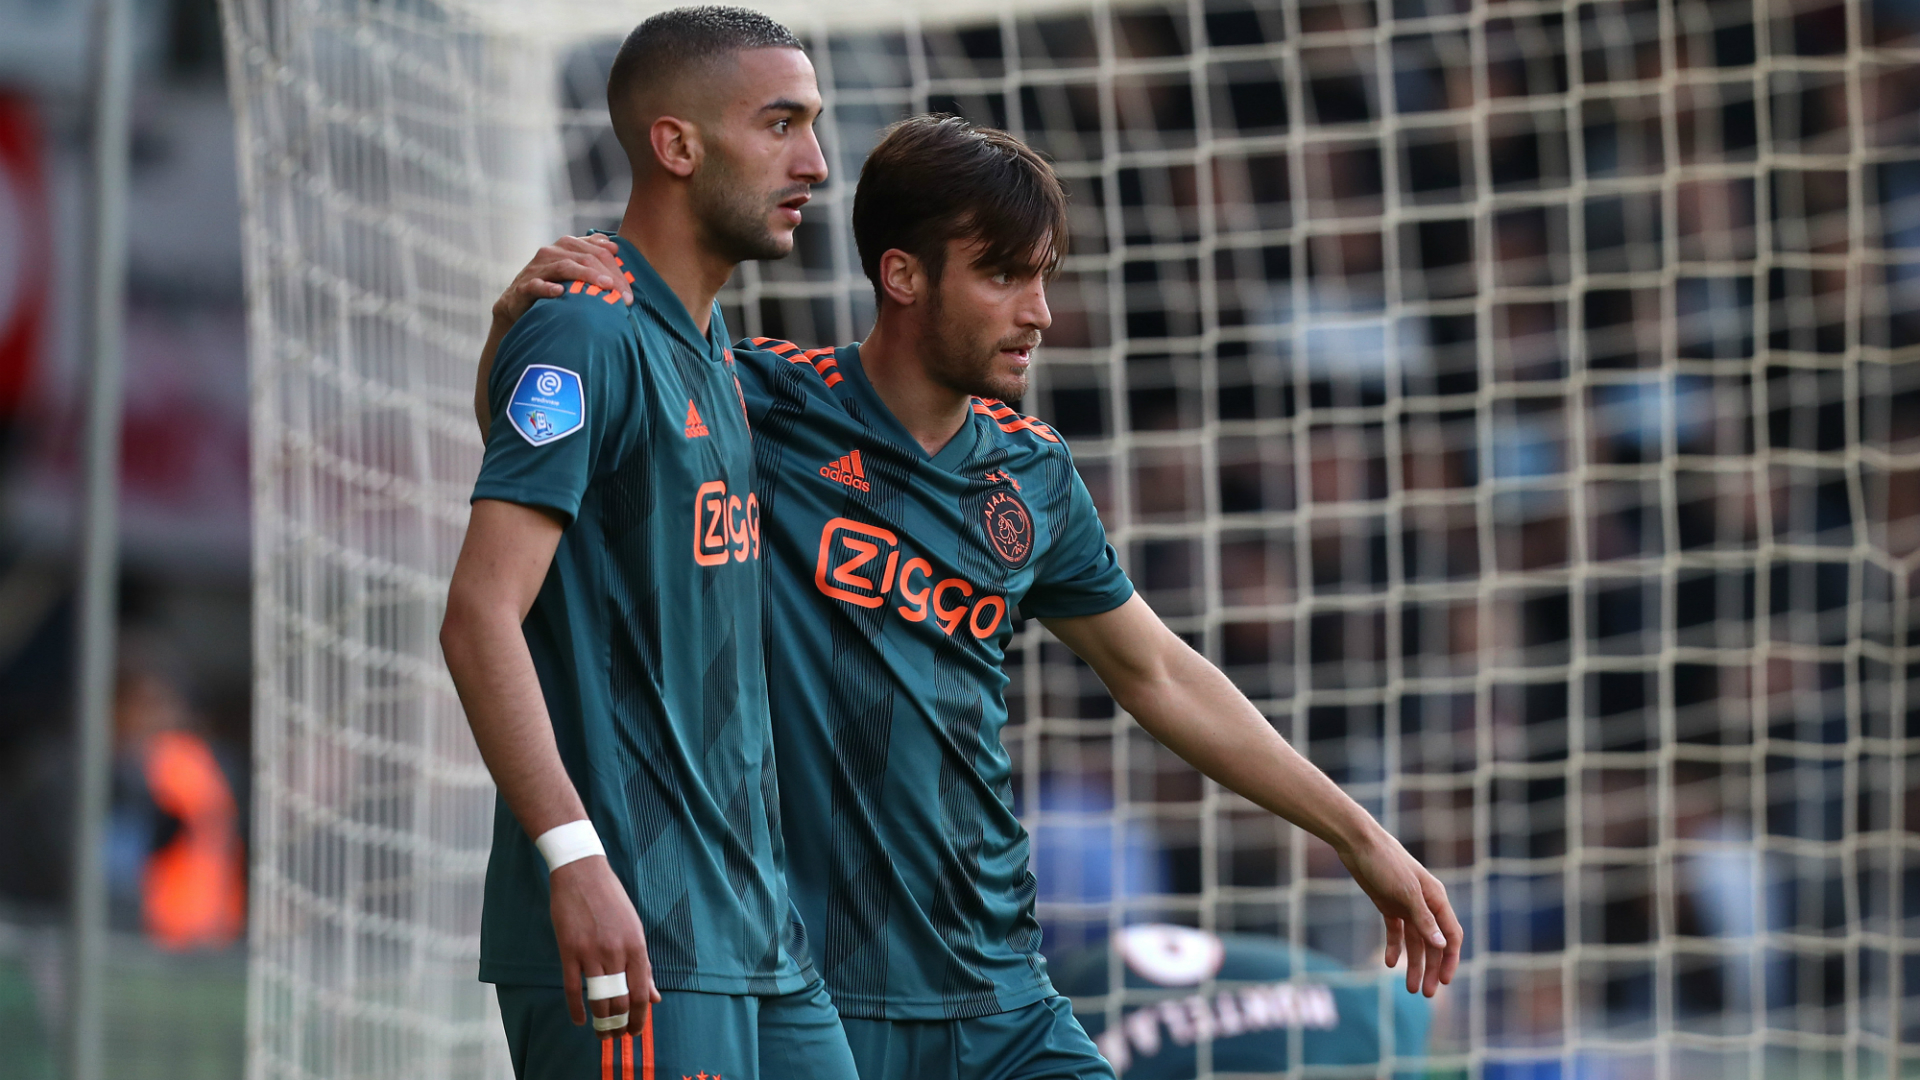 Hakim Ziyech Nicolas Tagliafico Ajax 05152019